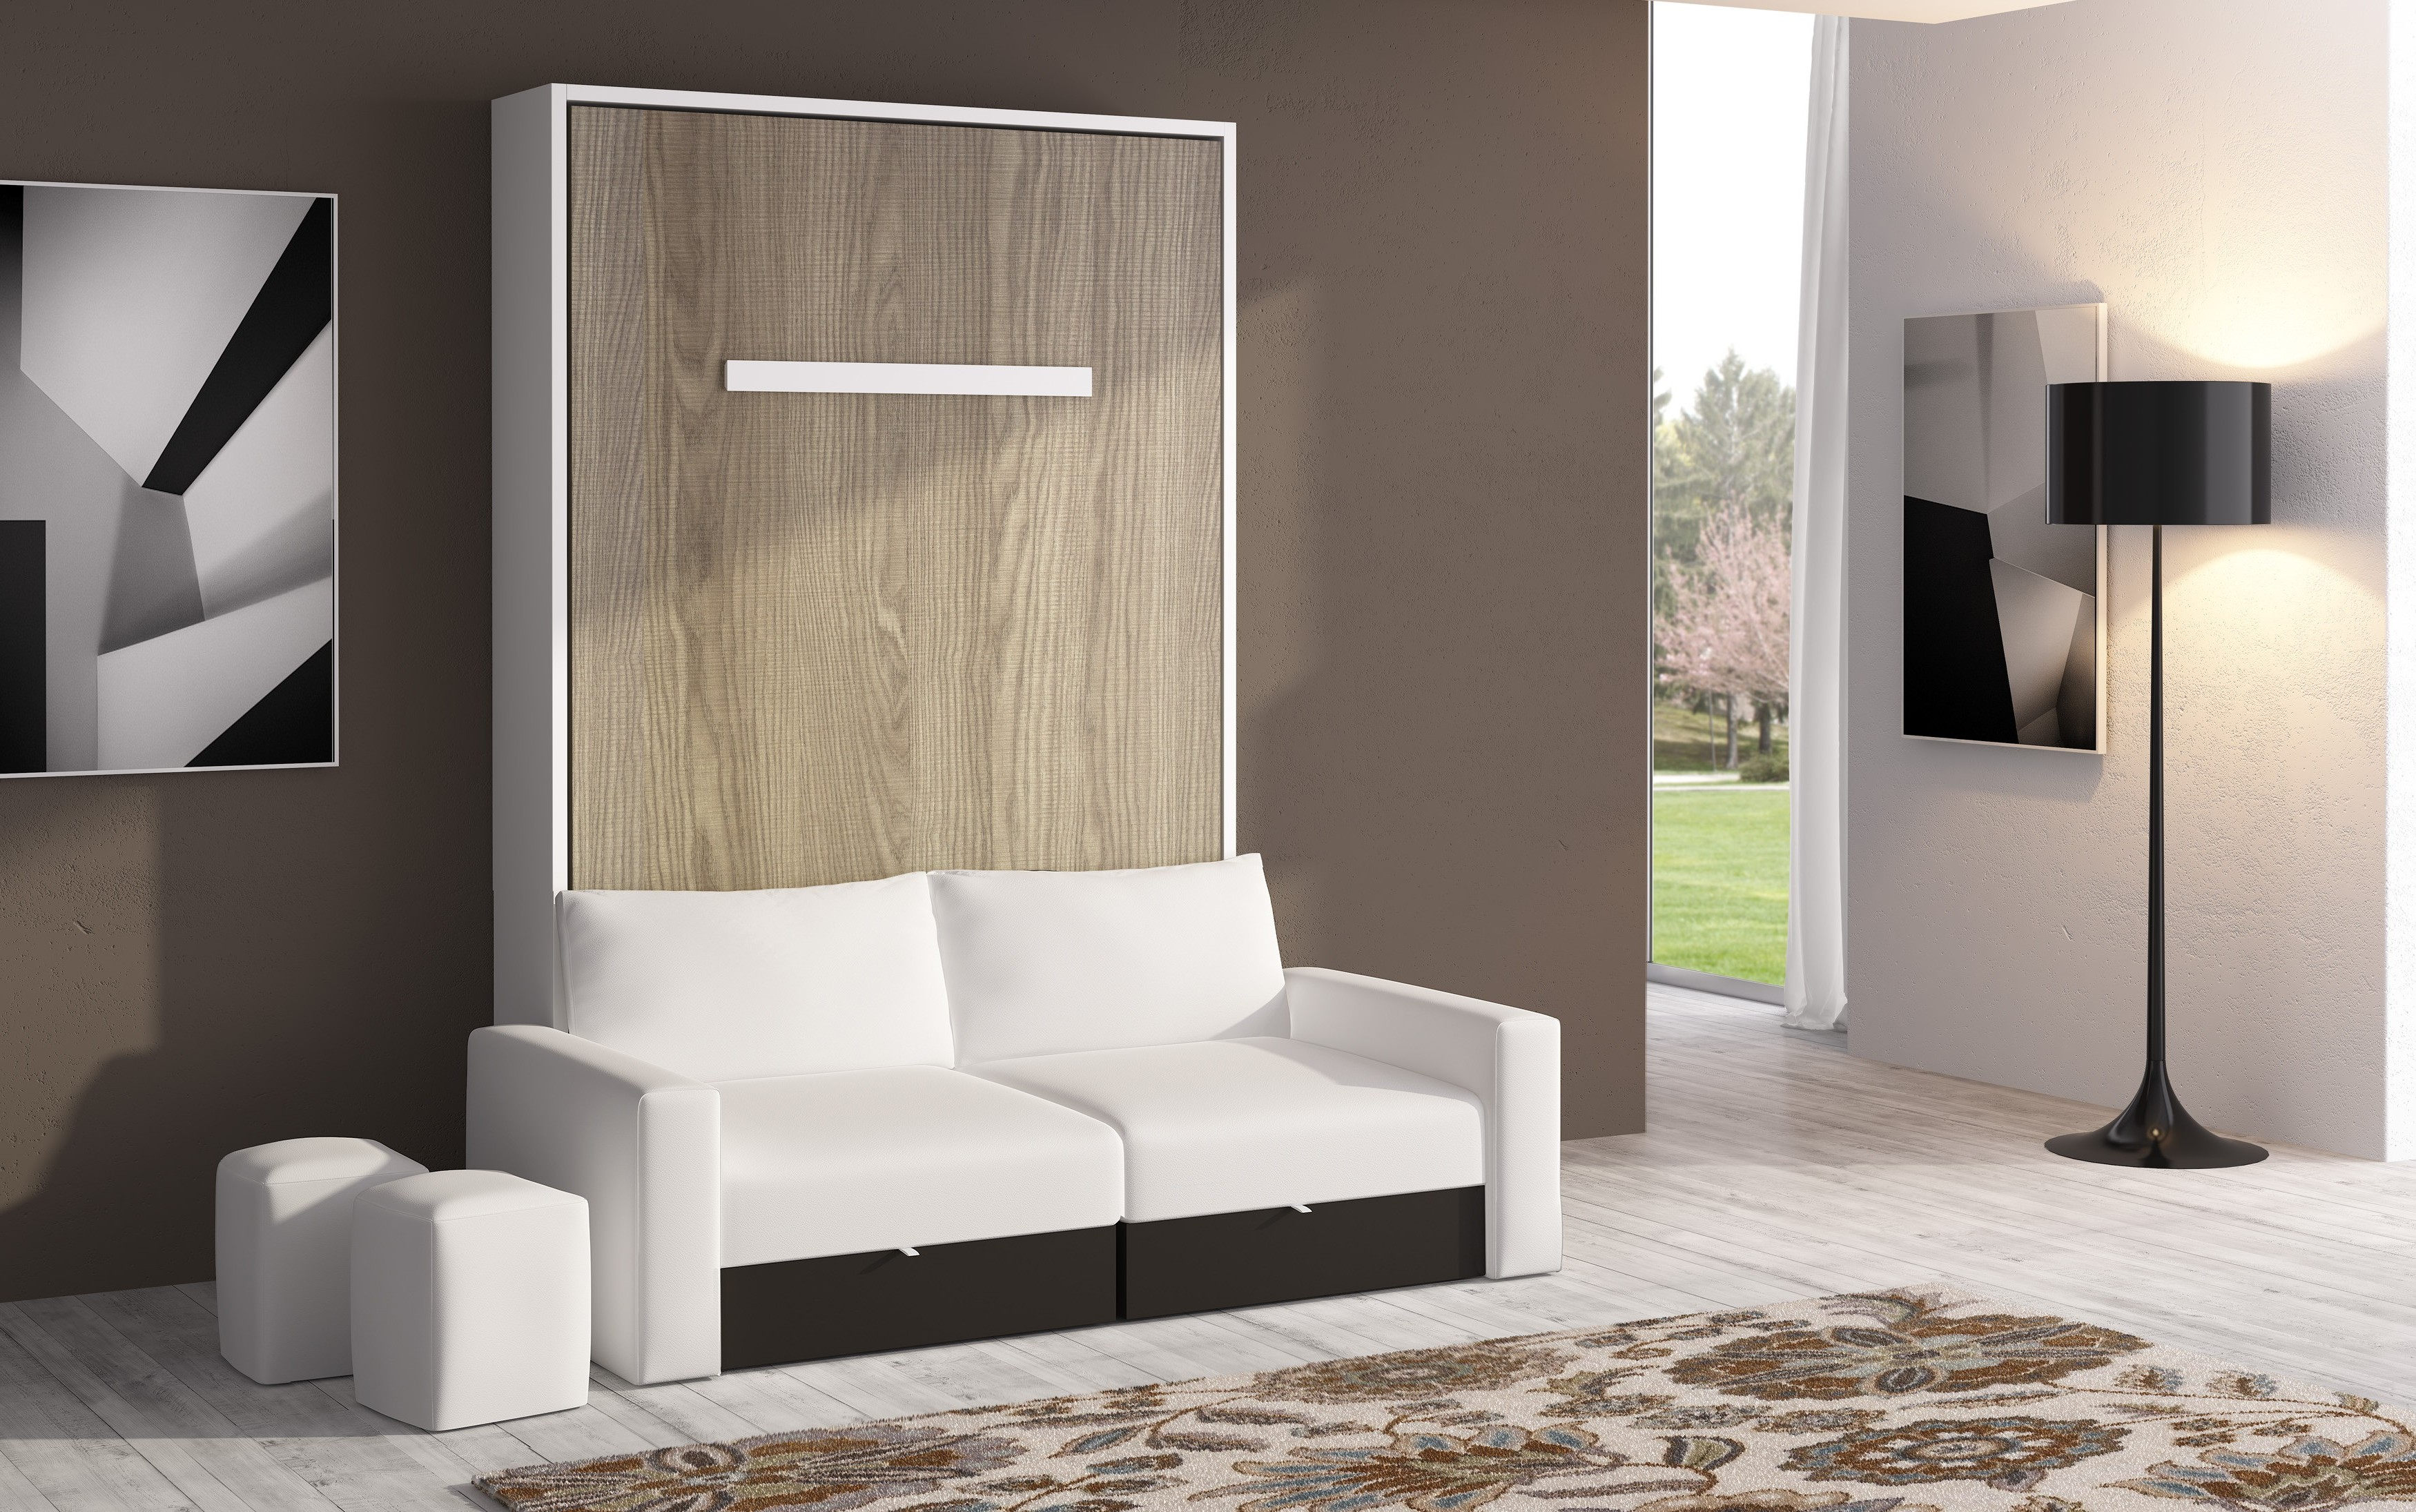 lit escamotable avec canape integre canap id es de d coration de maison xgnvyjjb62. Black Bedroom Furniture Sets. Home Design Ideas